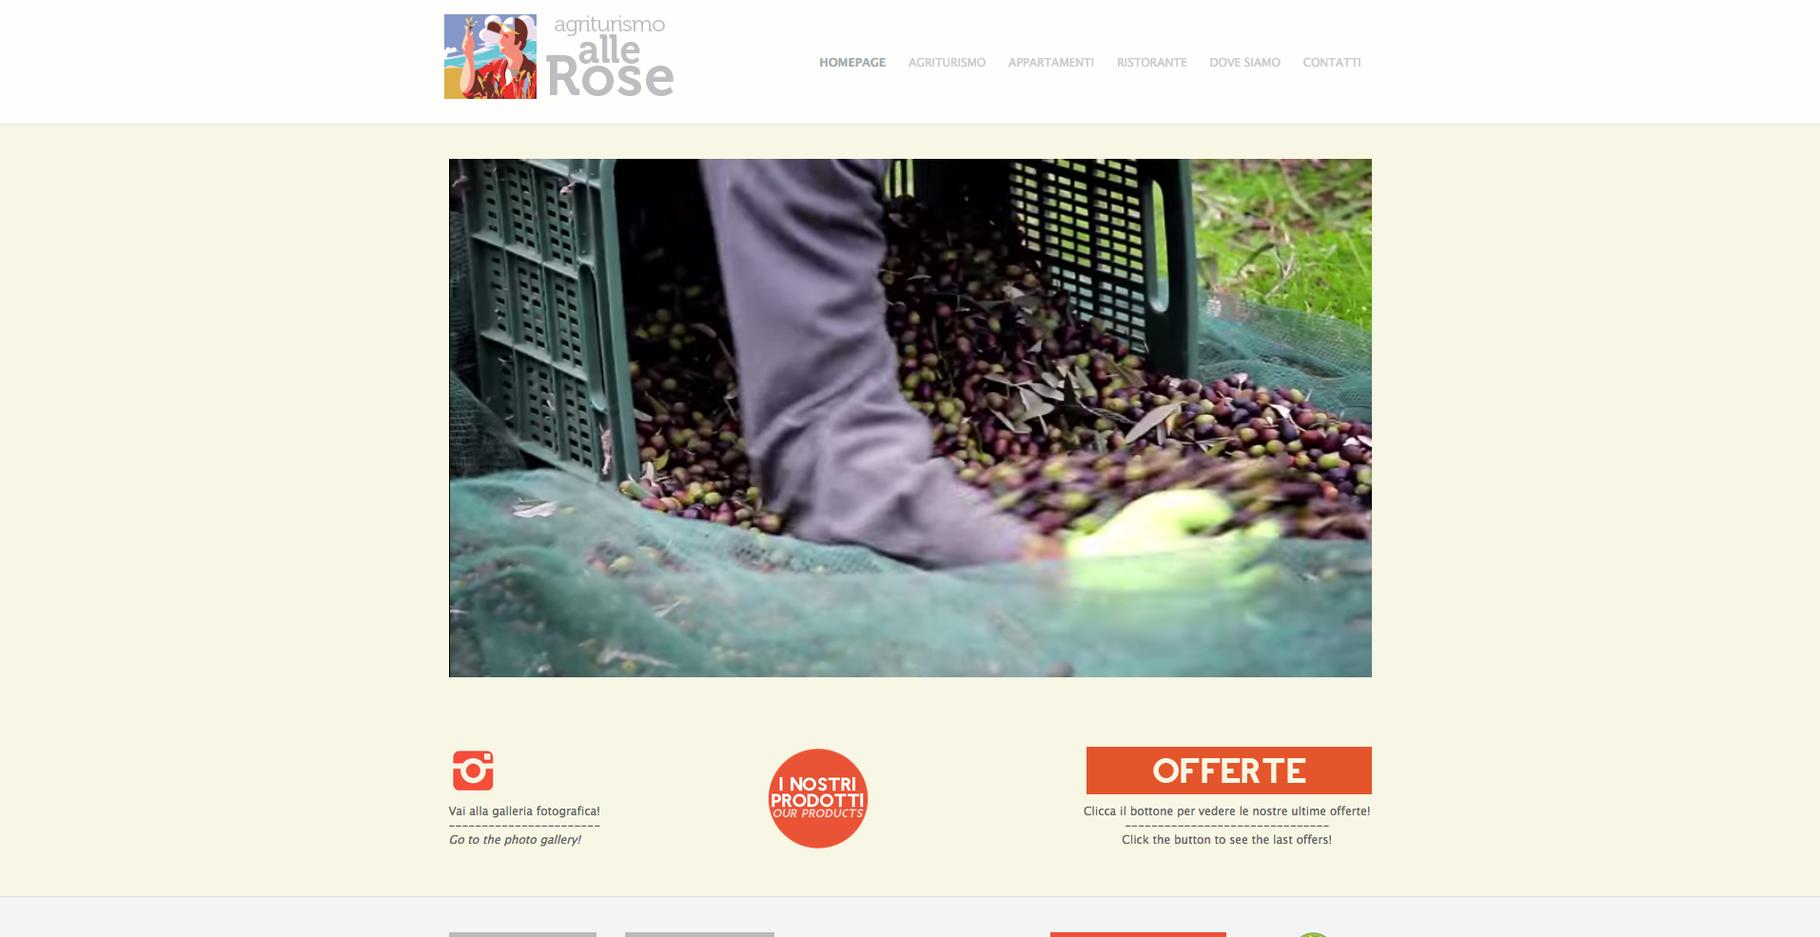 www.agriturismoallerose.com